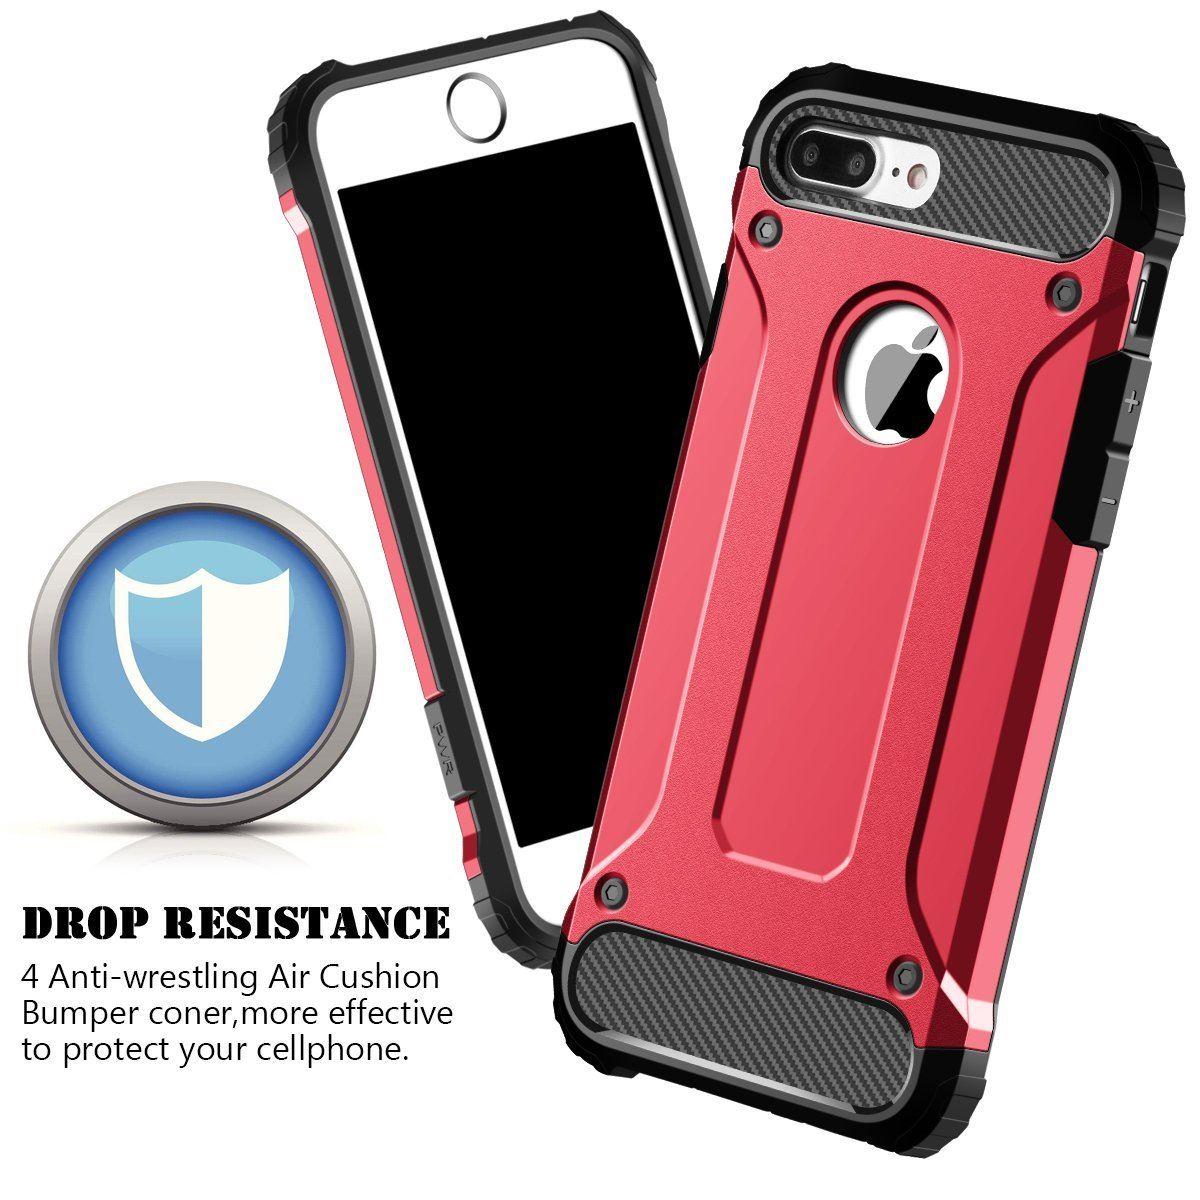 thumbnail 26 - For Apple iPhone 11 Pro Max XR Xs X 8 7 Plus 6 5 Se Case Cover Impact Heavy Duty